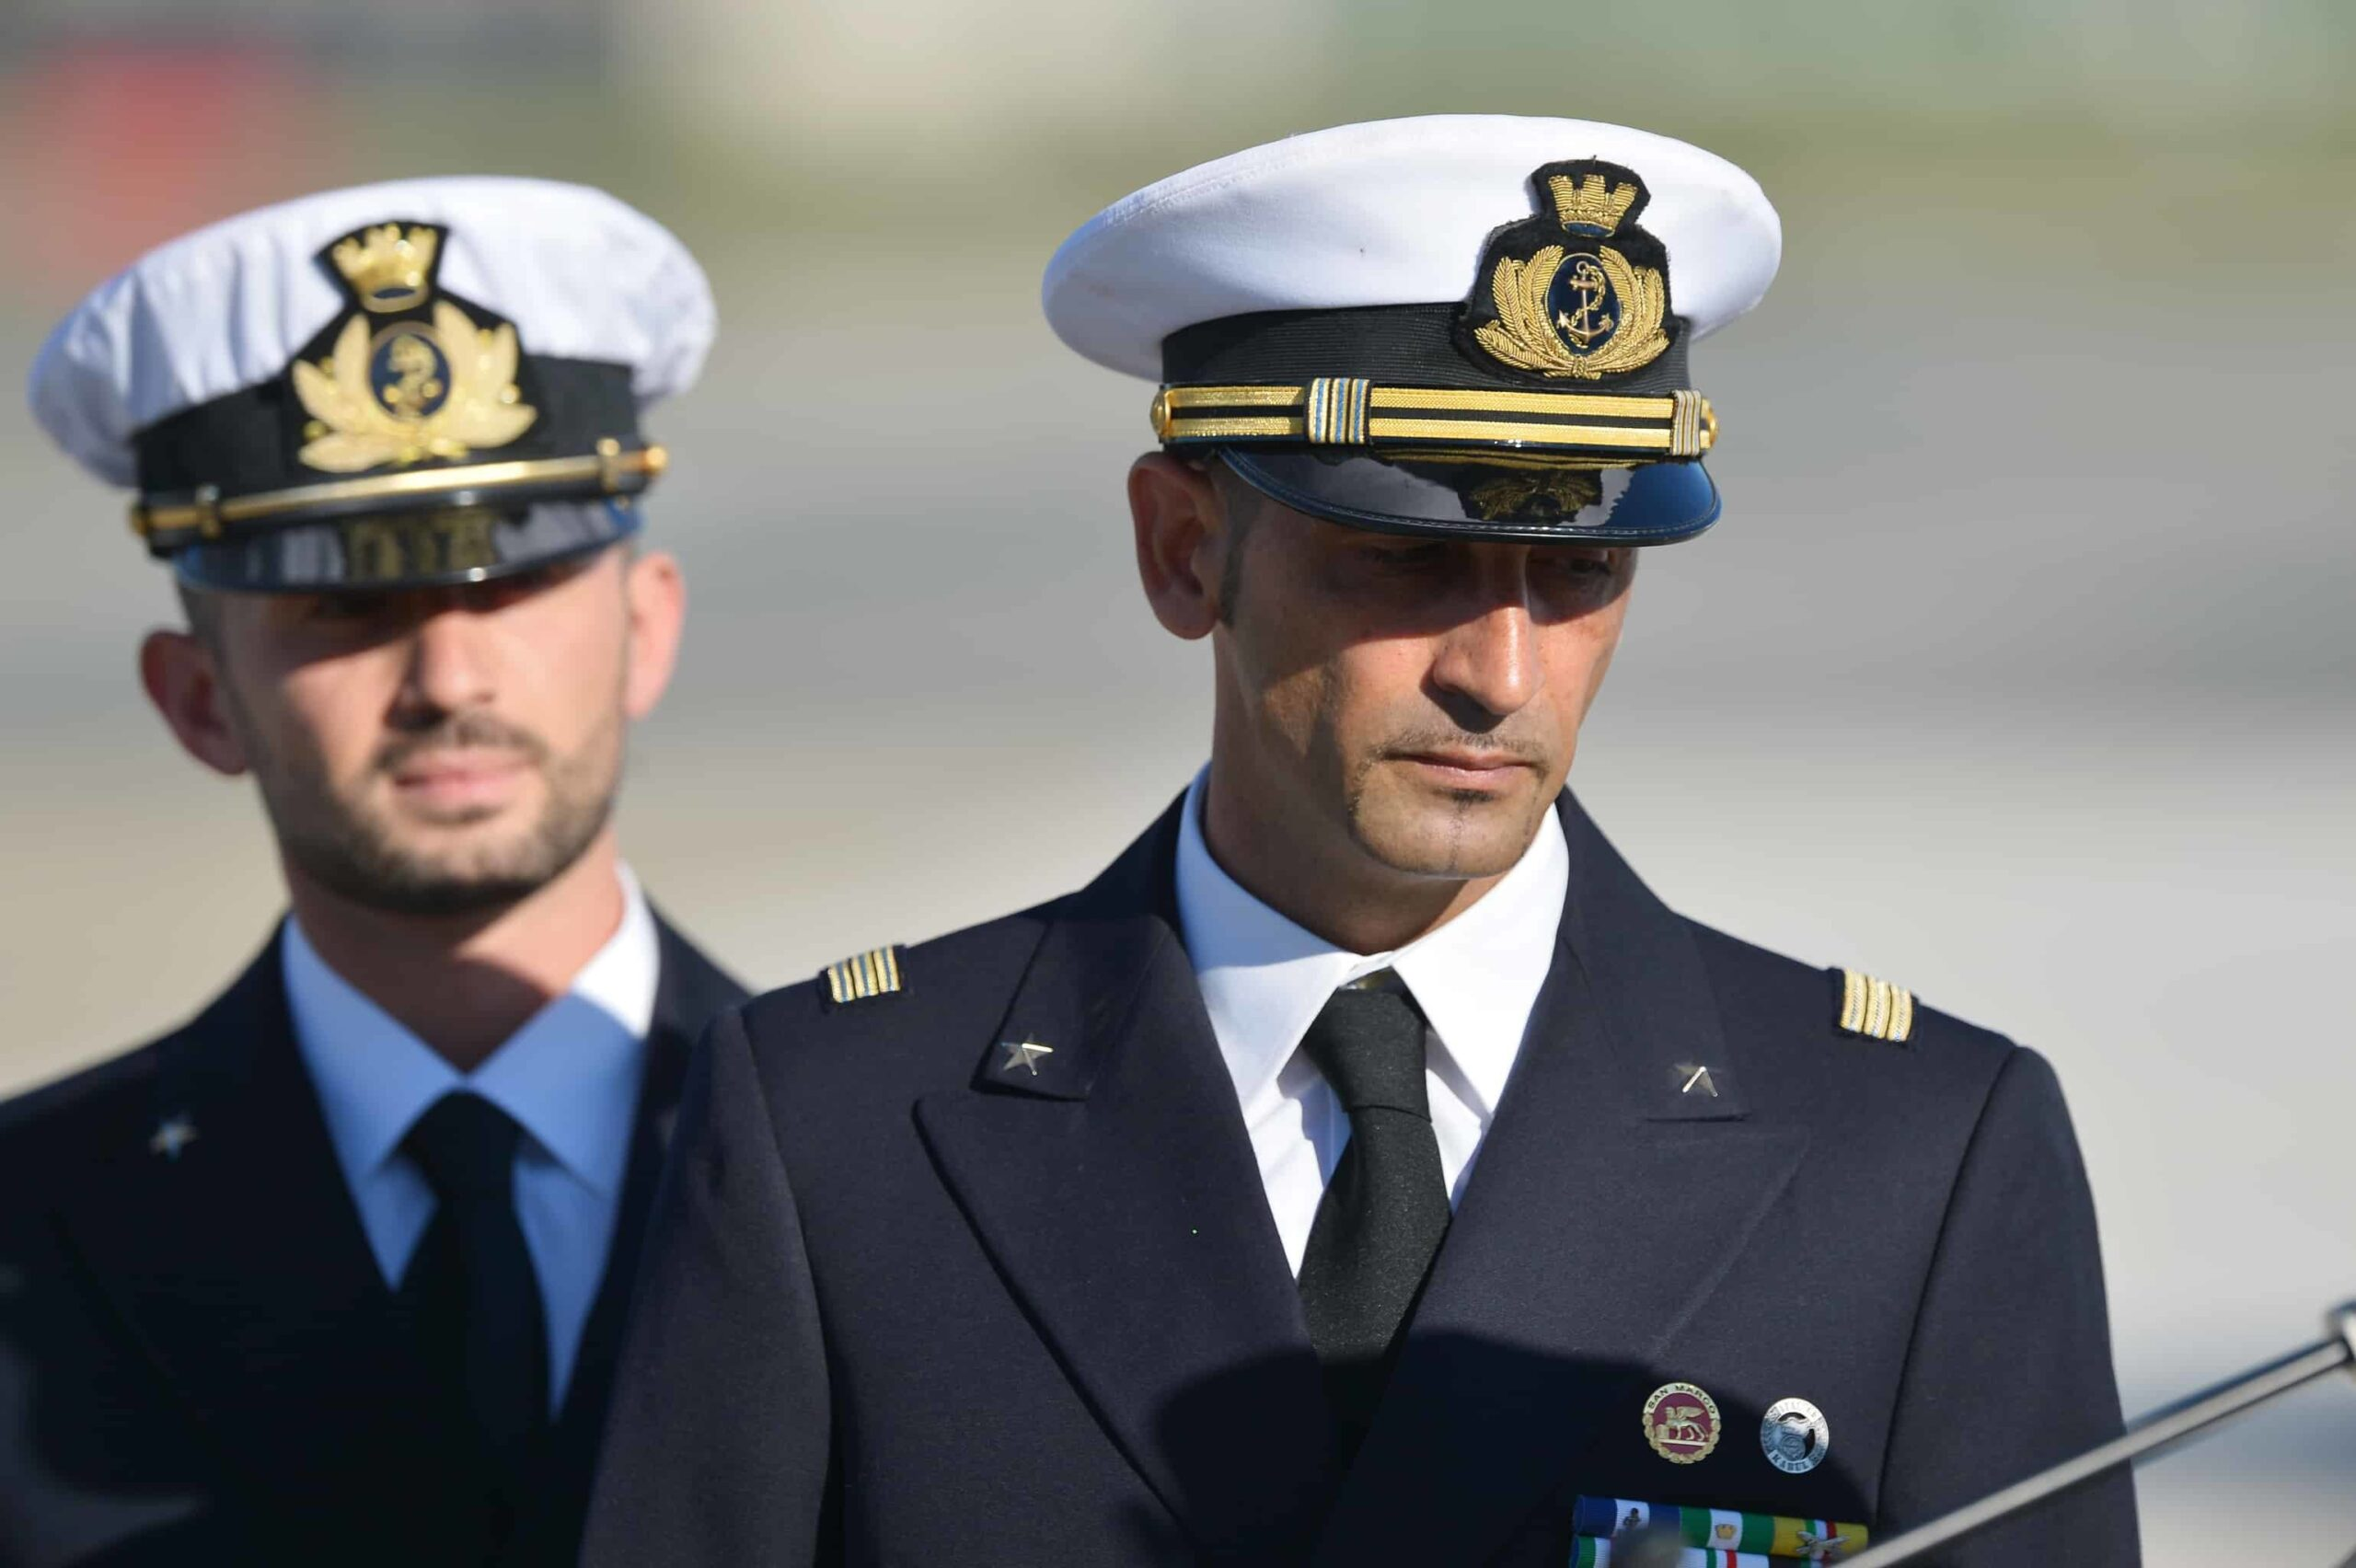 maro-tribunale-aja-processo-italia